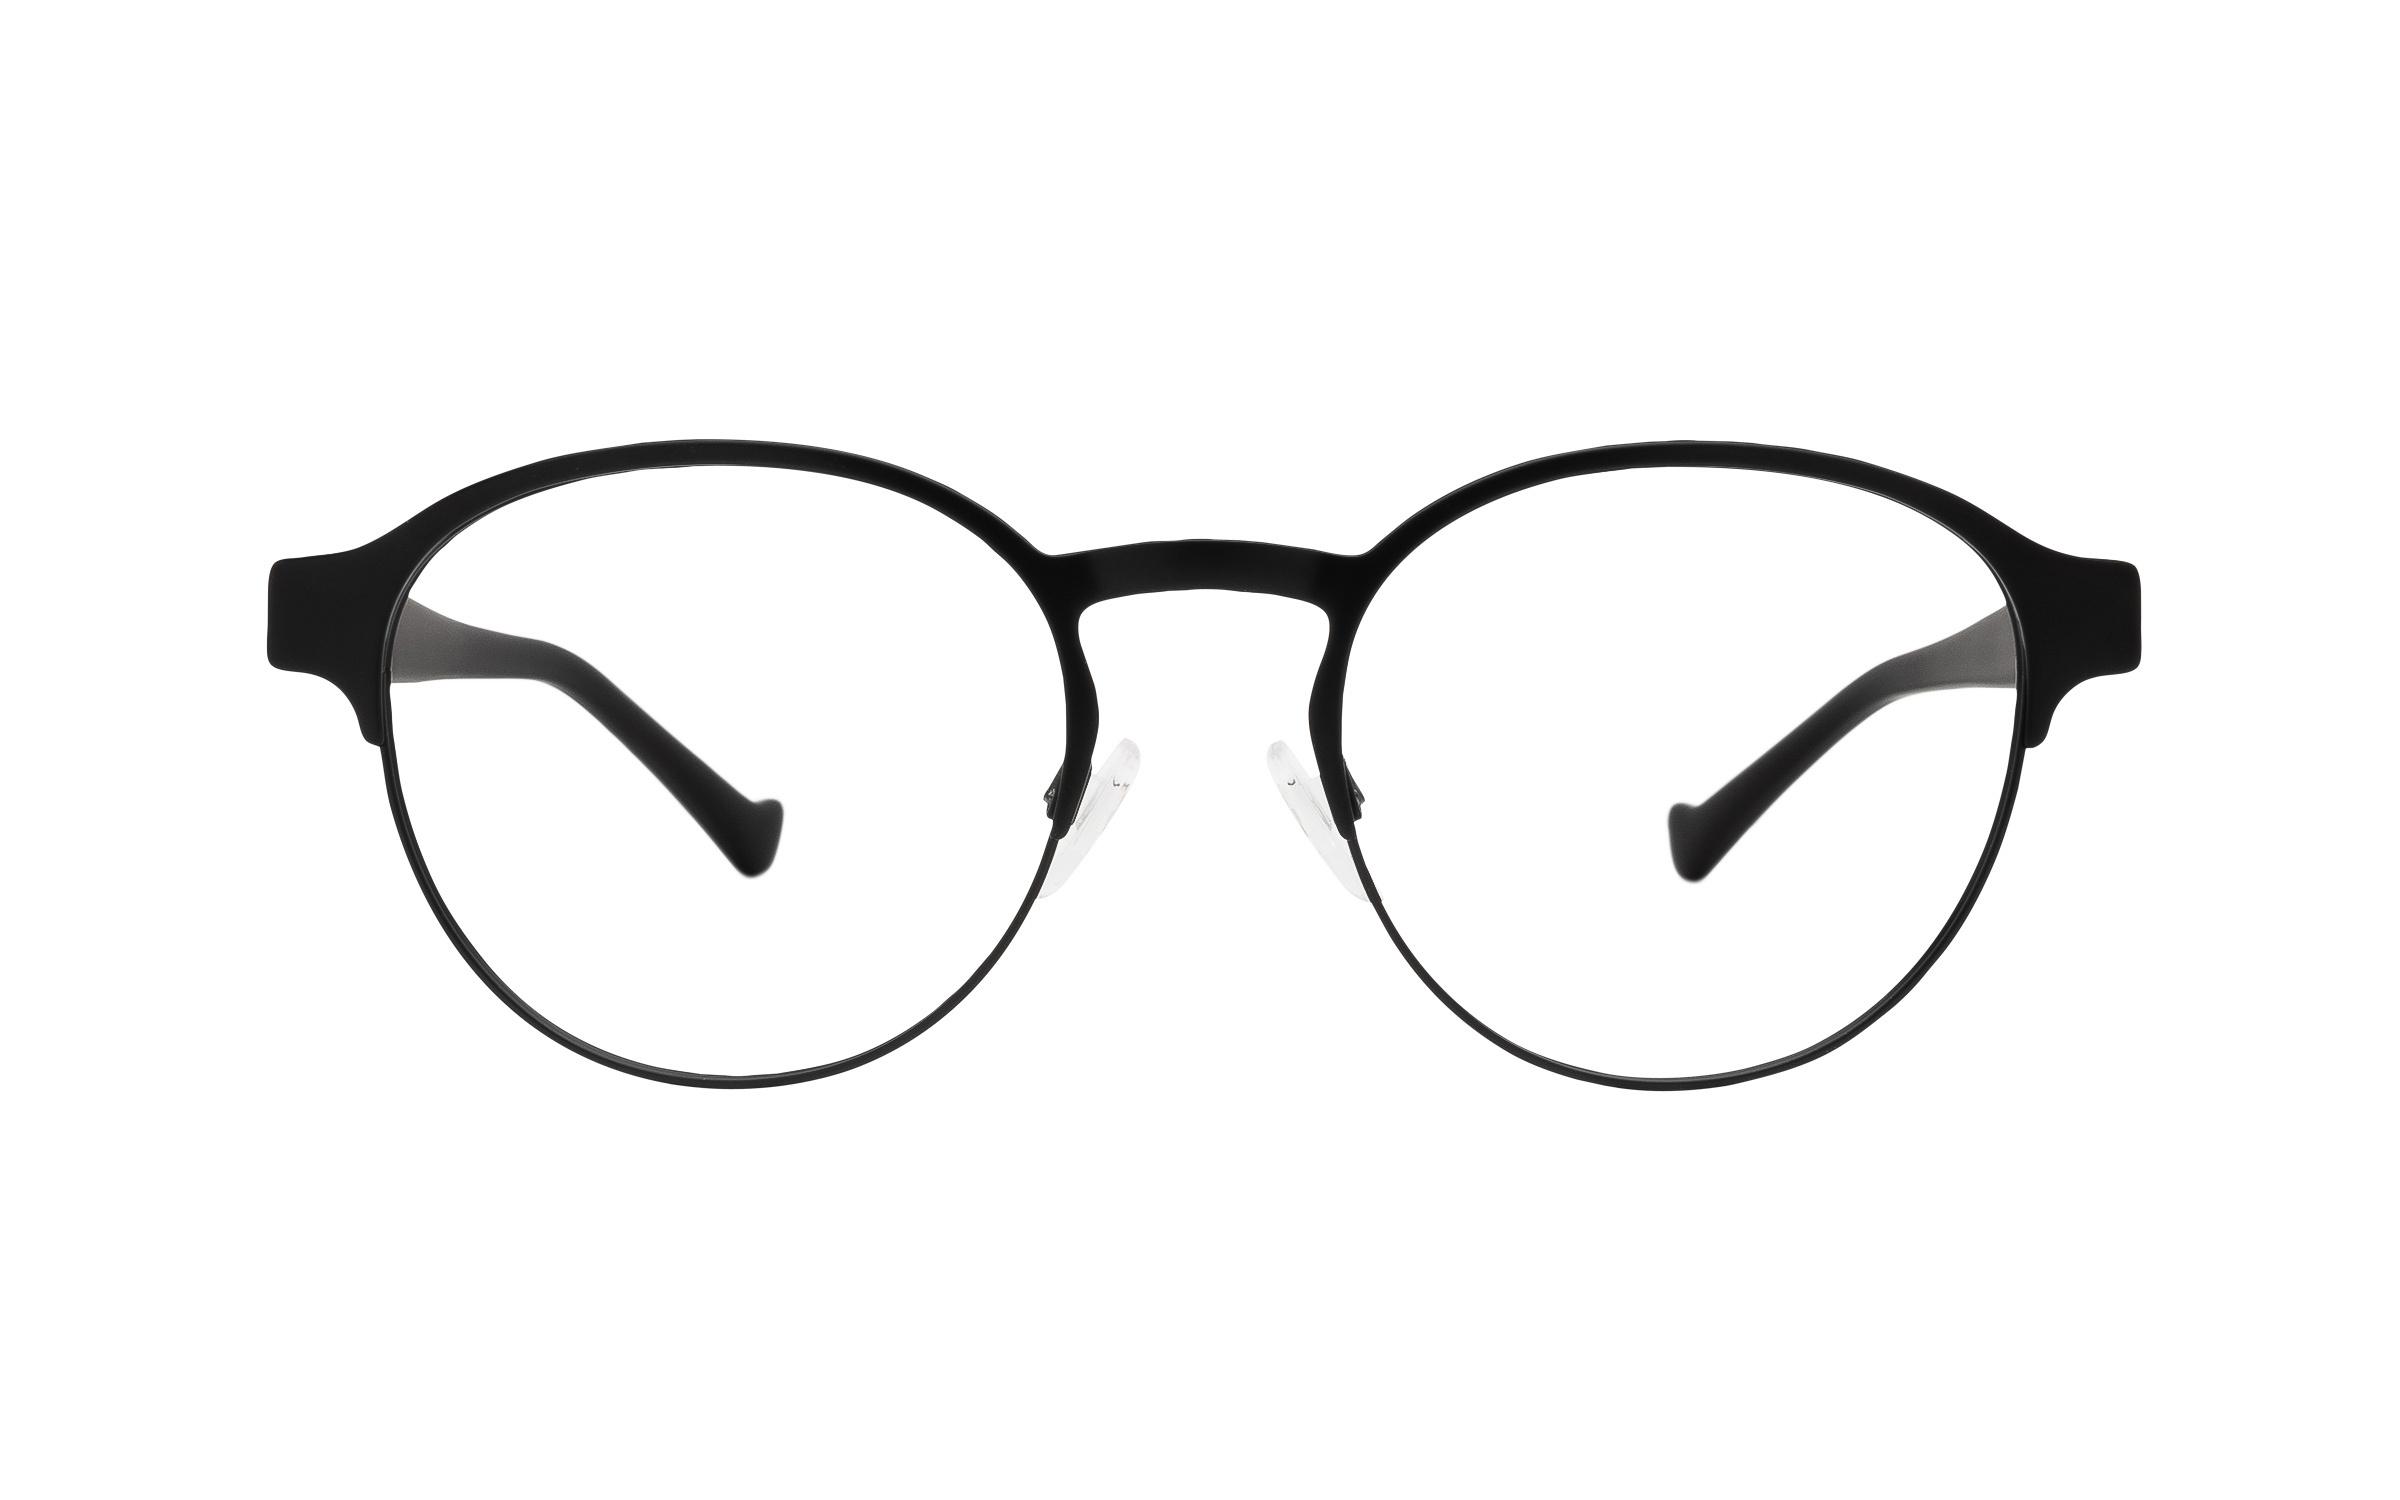 coastal.com - Emporio Armani EA1097 3014 (51) Eyeglasses and Frame in Matte Black – Online Coastal 188.00 USD